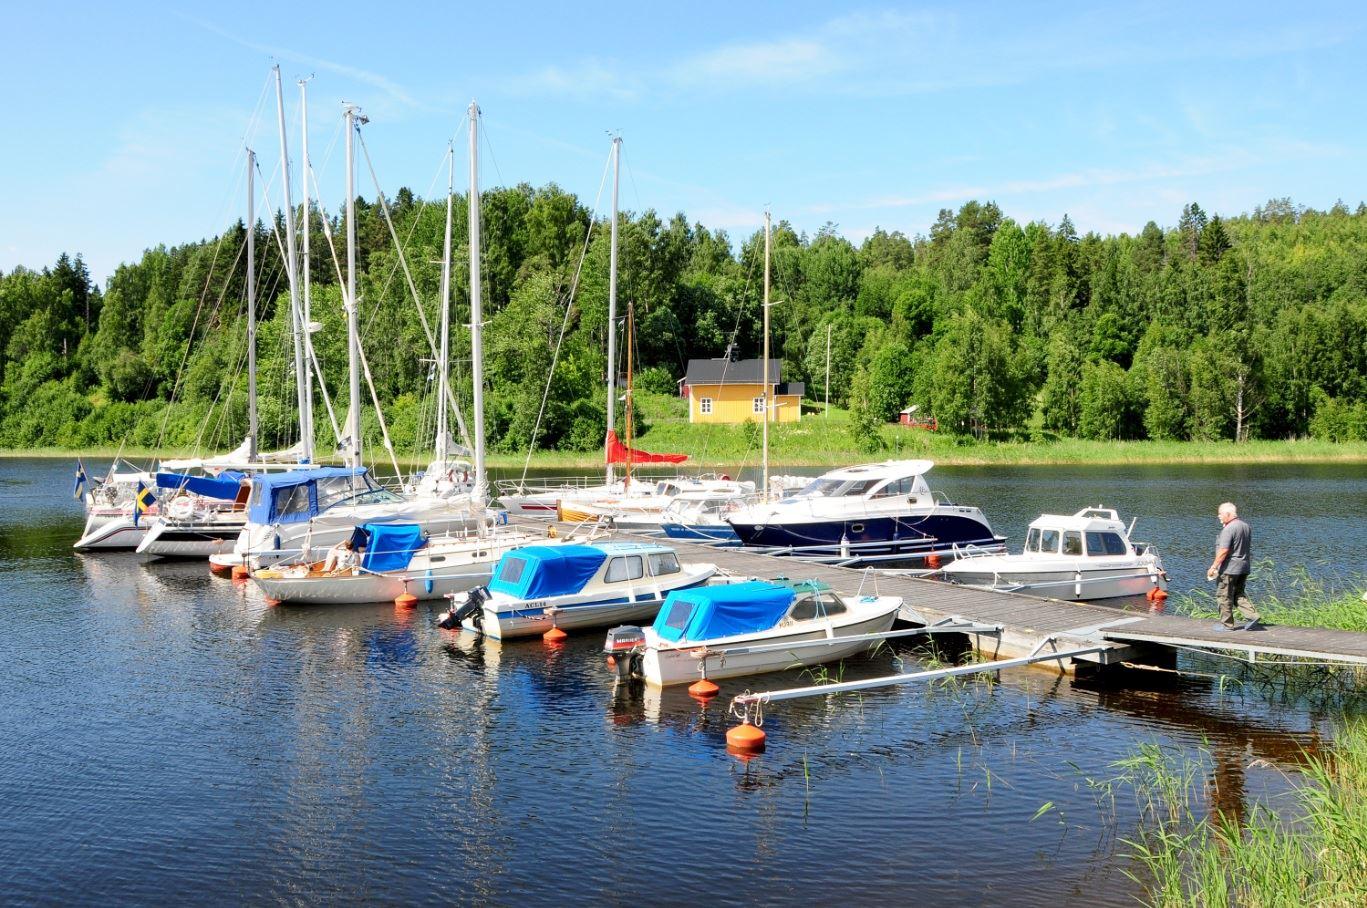 Foto: Urban Lidbaum,  © Kramfors kommun, Hornö brygga